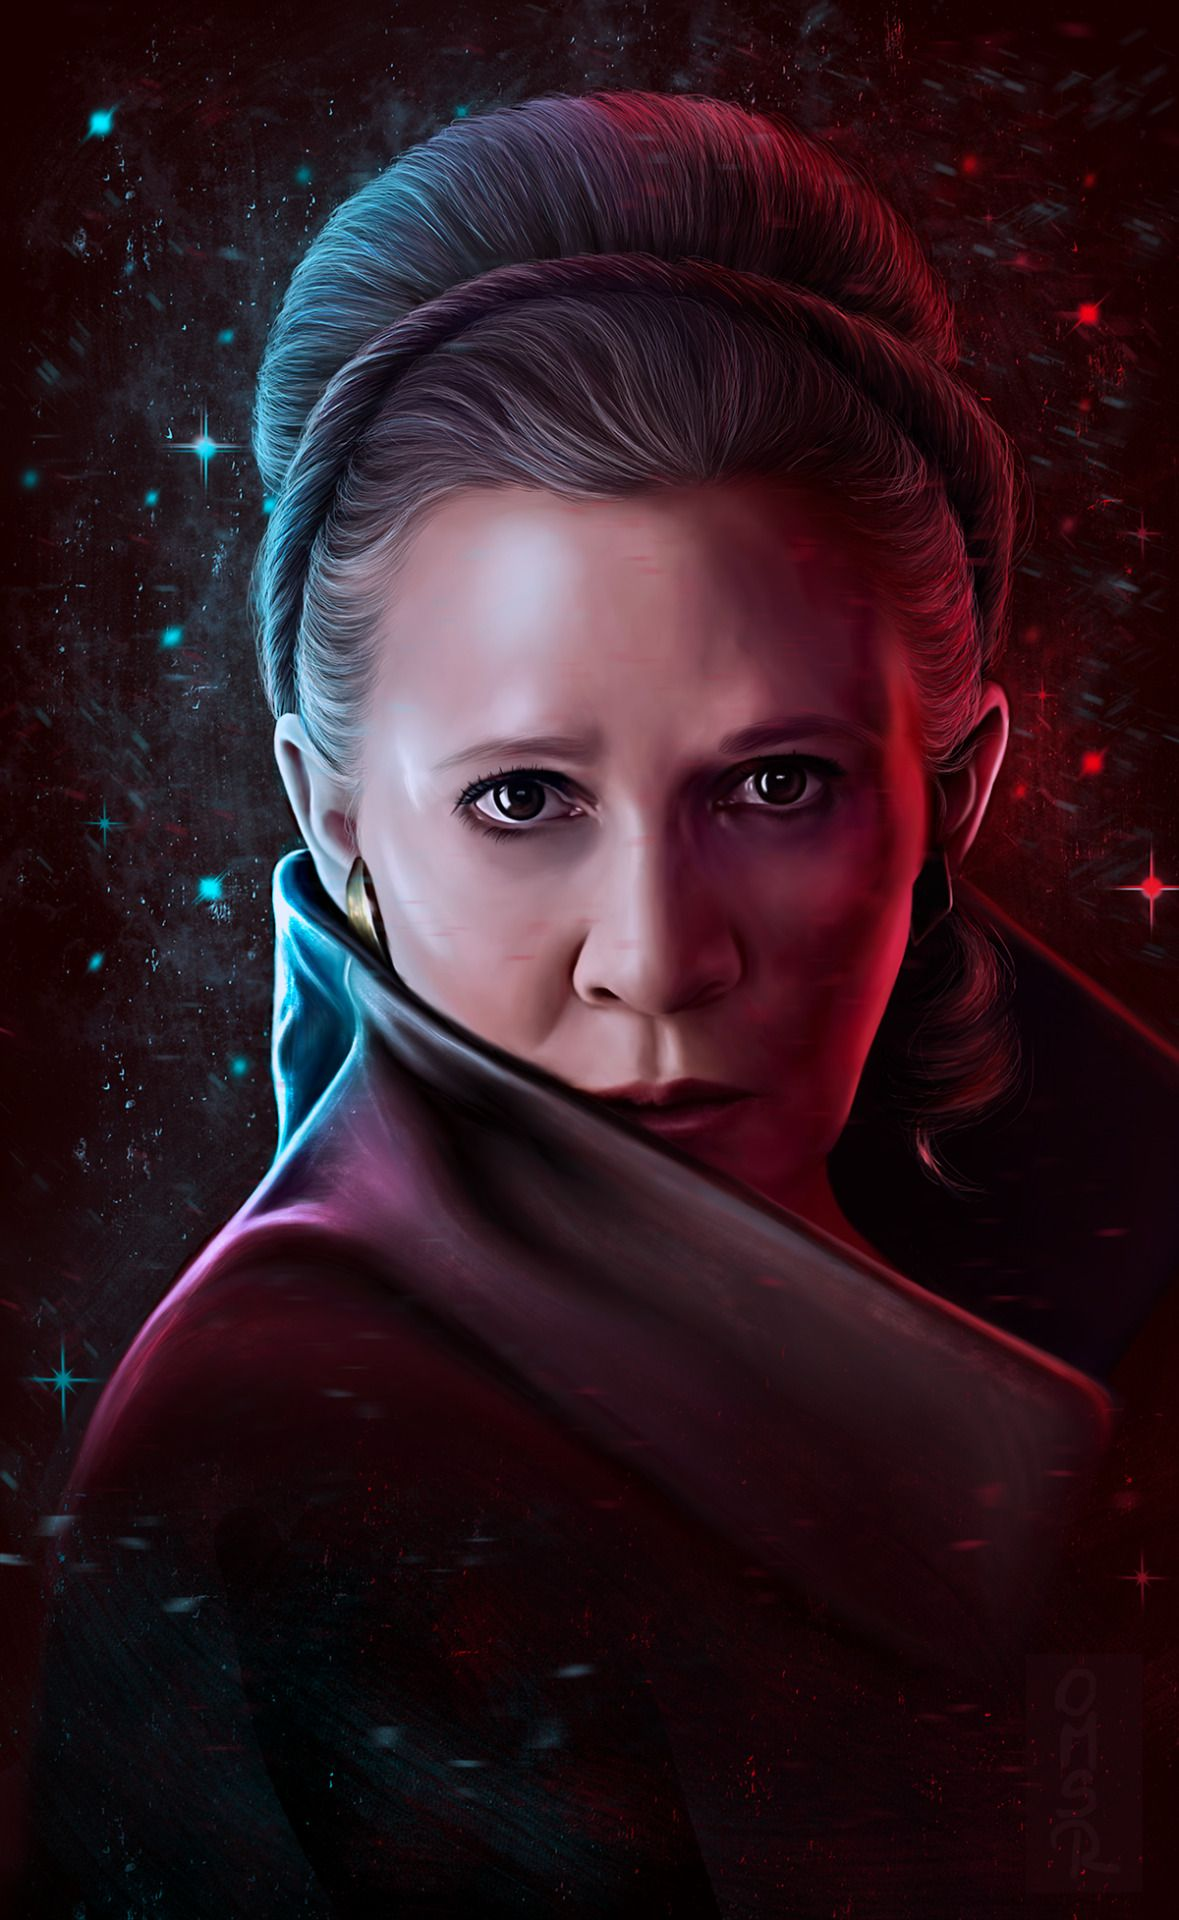 General Leia Organa Star Wars Images Star Wars Pictures Star Wars Princess Leia